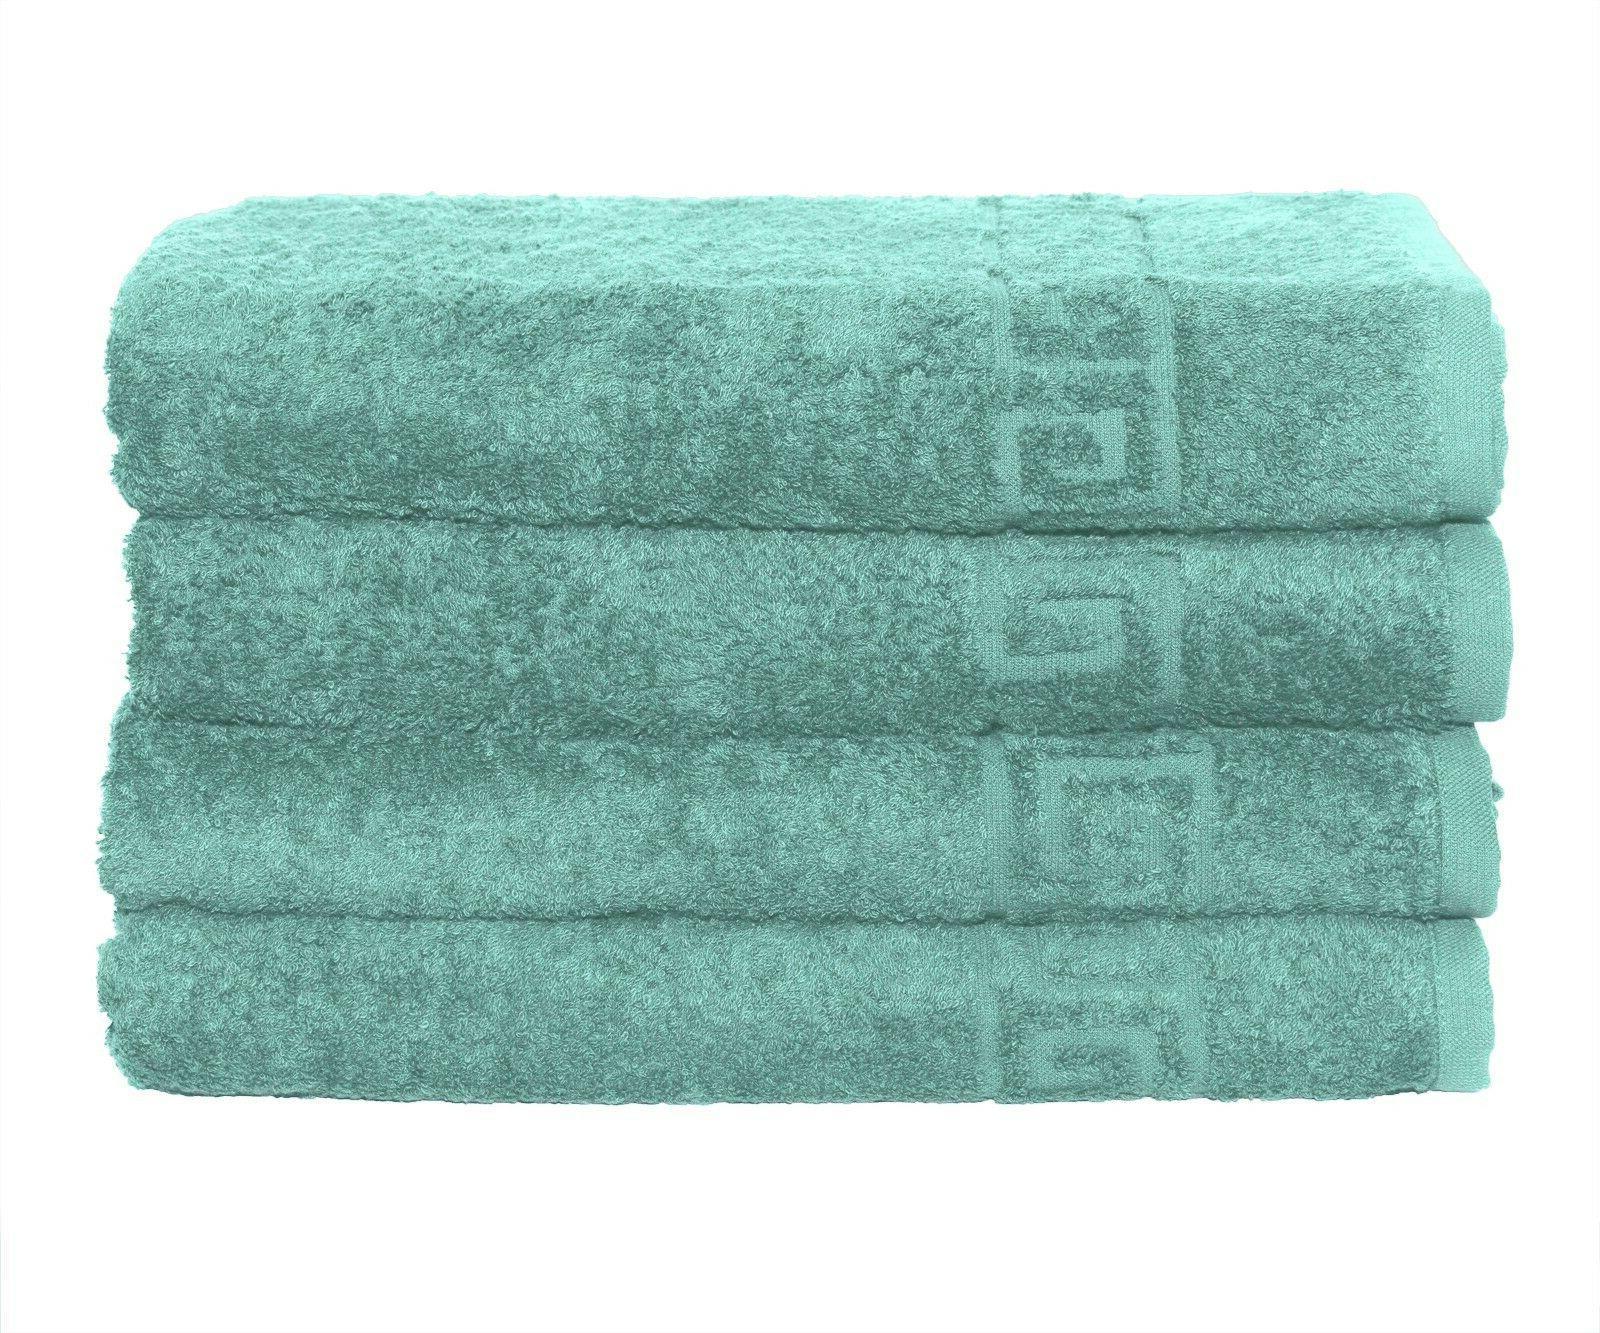 Bath Towel Cotton 4 28x56 Inch 500GSM Absorbent Contex